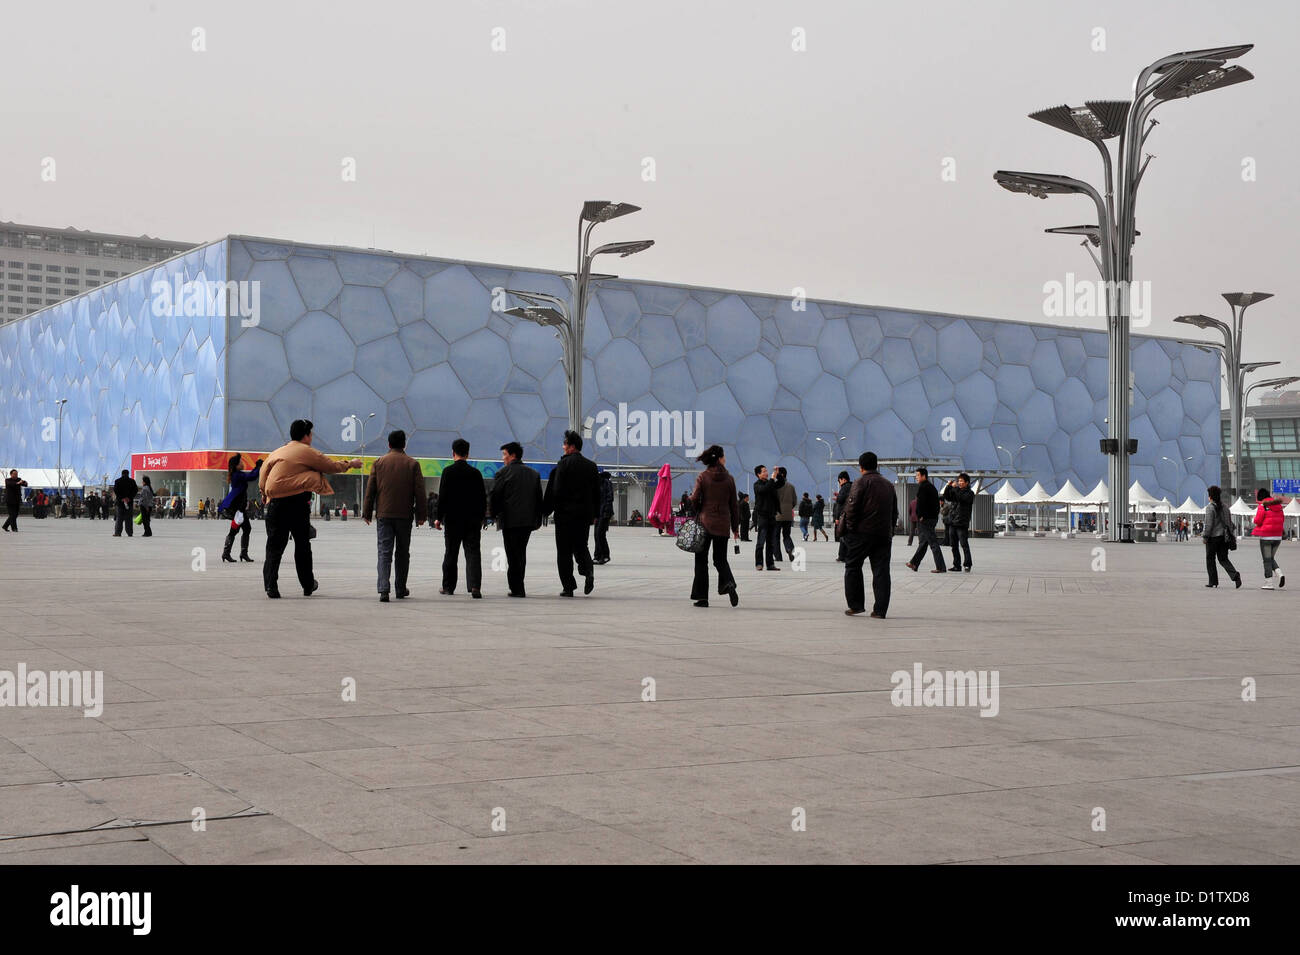 The national aquatics center in Beijing, China Stock Photo